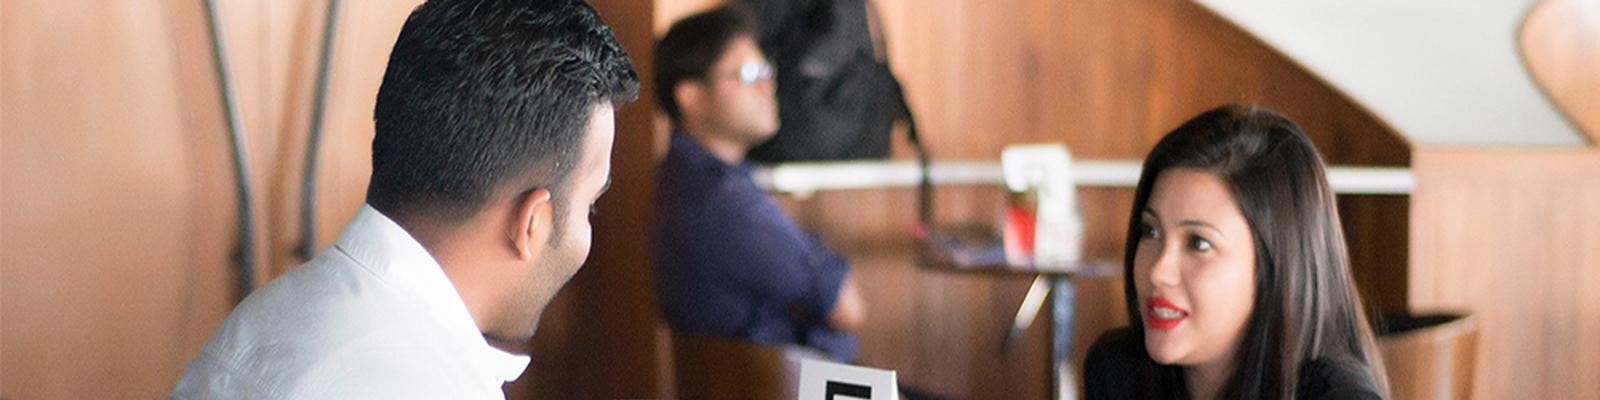 mumbai speed datinga pennsylvaniai egyetem bekapcsolódott